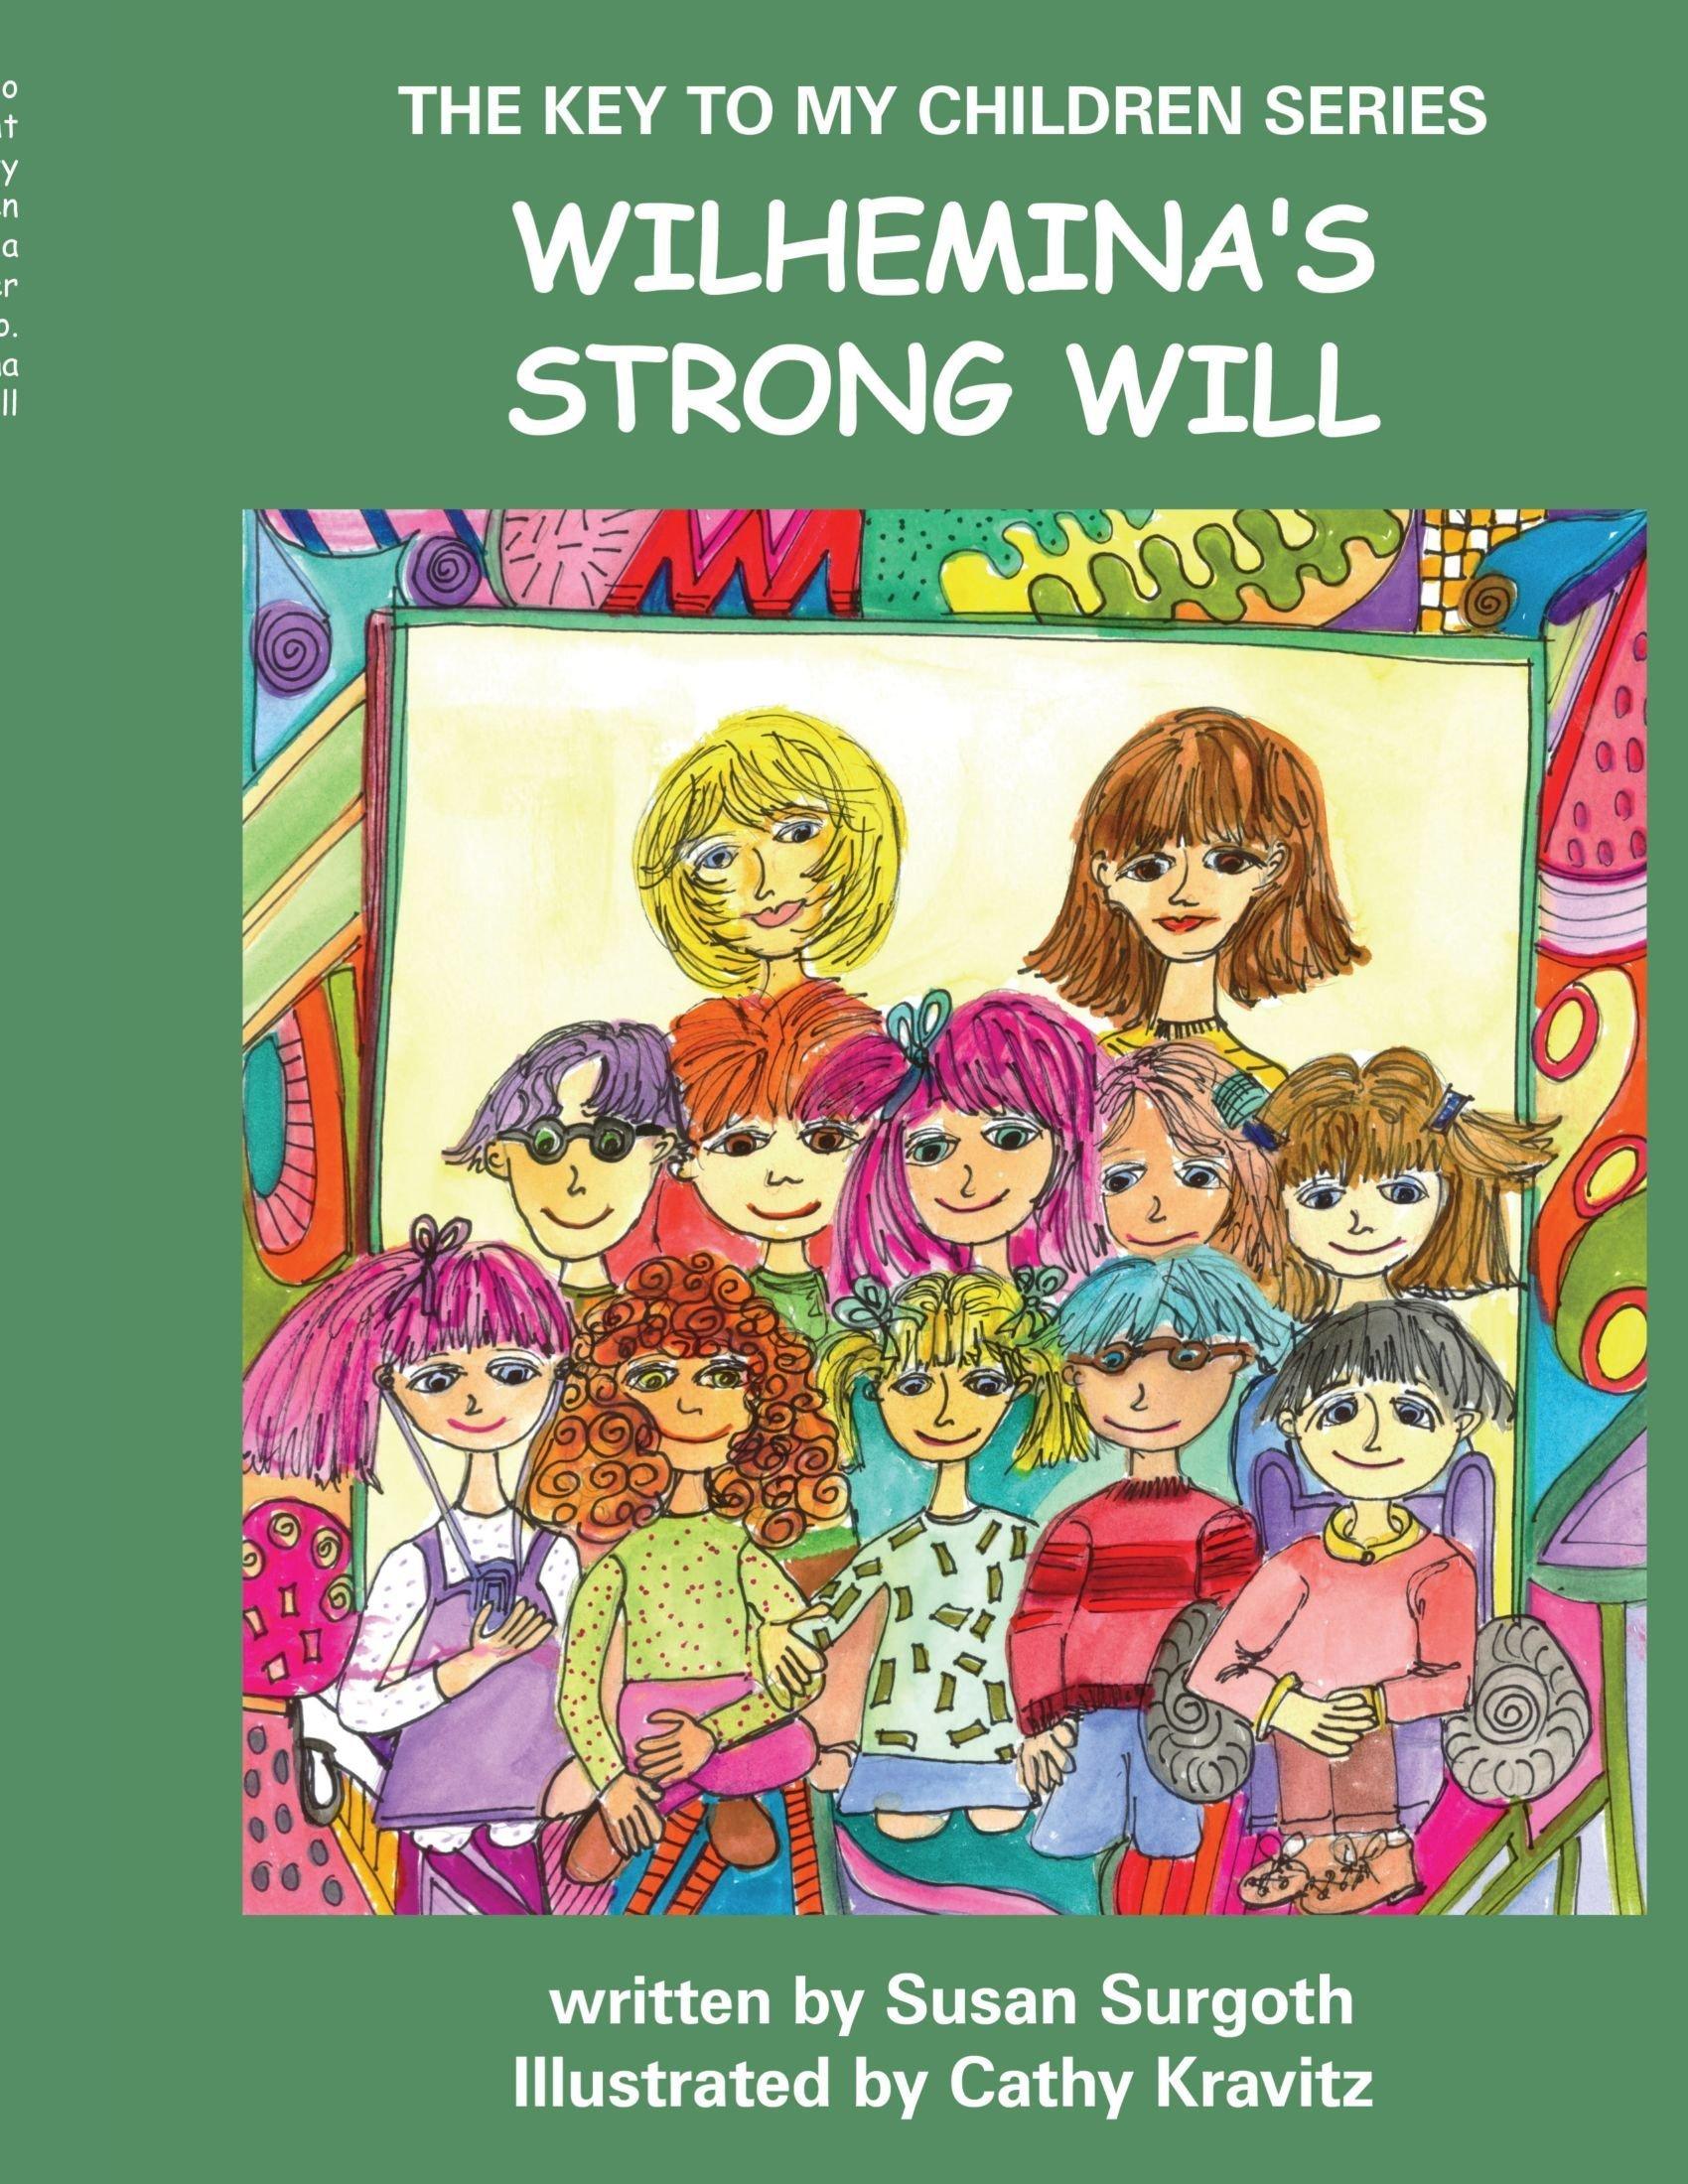 THE KEY TO MY CHILDREN SERIES: WILHEMINA'S STRONG WILL pdf